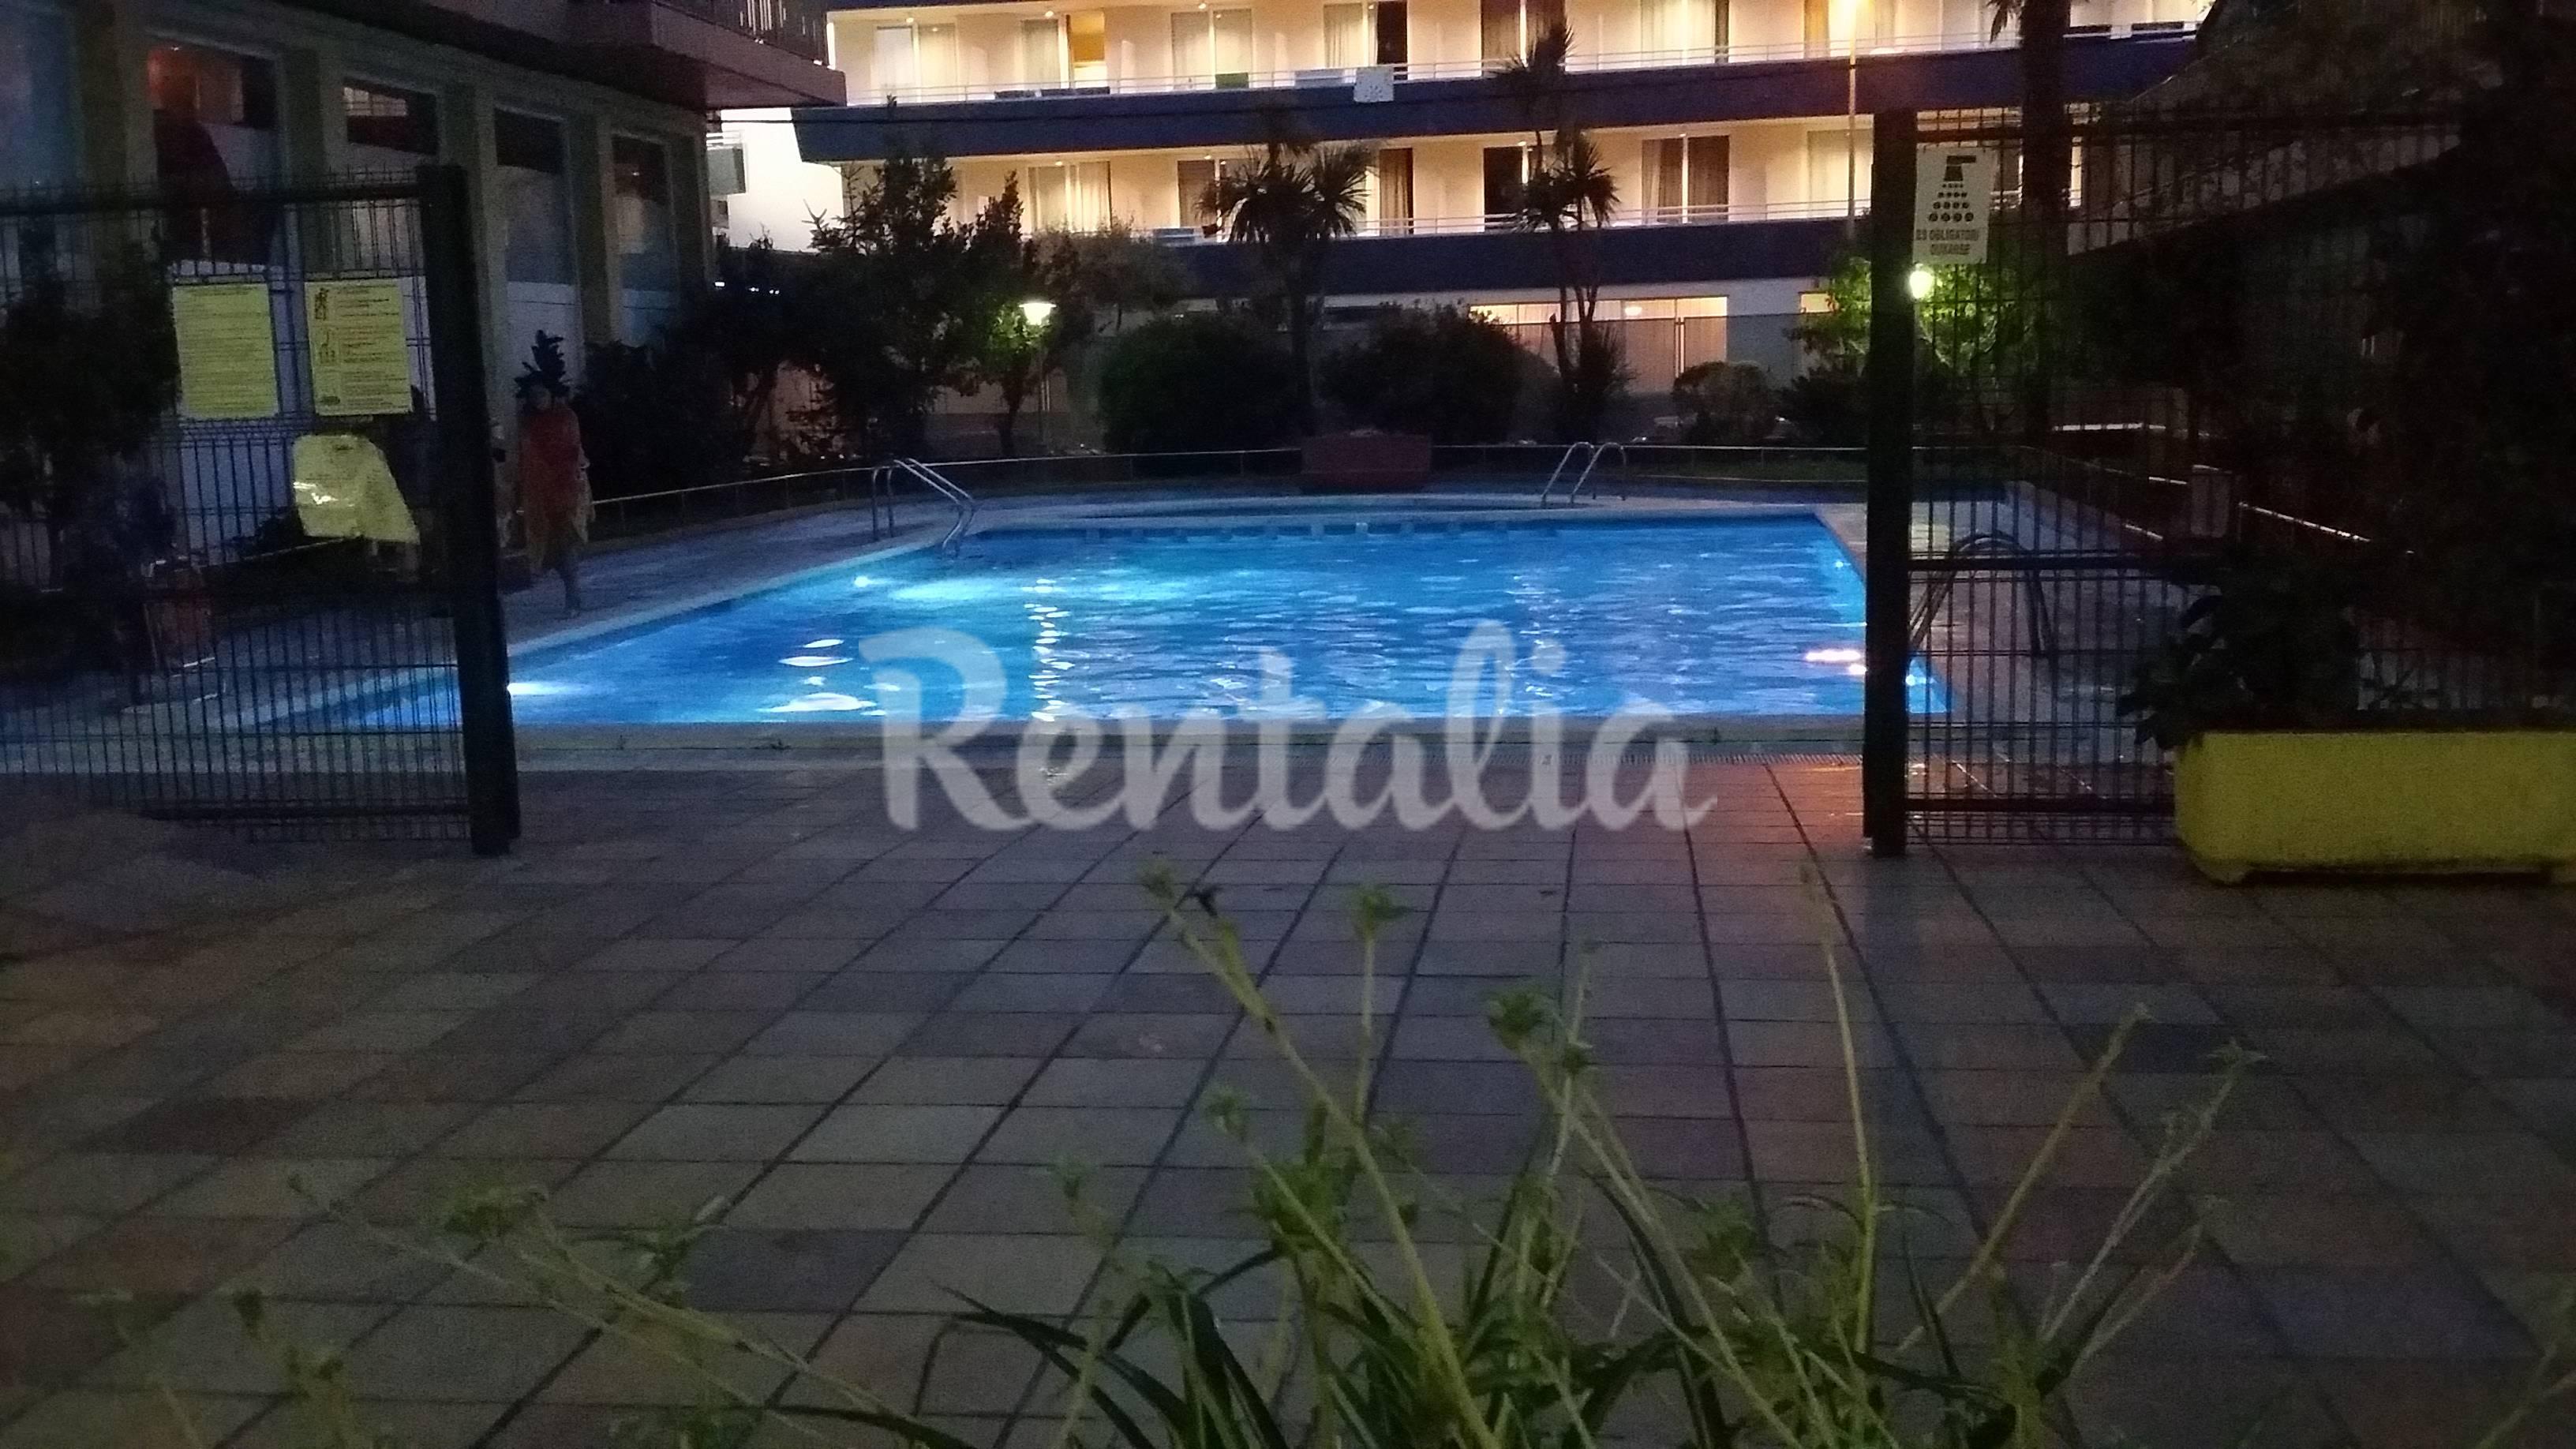 Apartamento con piscina a 5 minutos de la playa lloret for Hoteles en lloret de mar con piscina climatizada